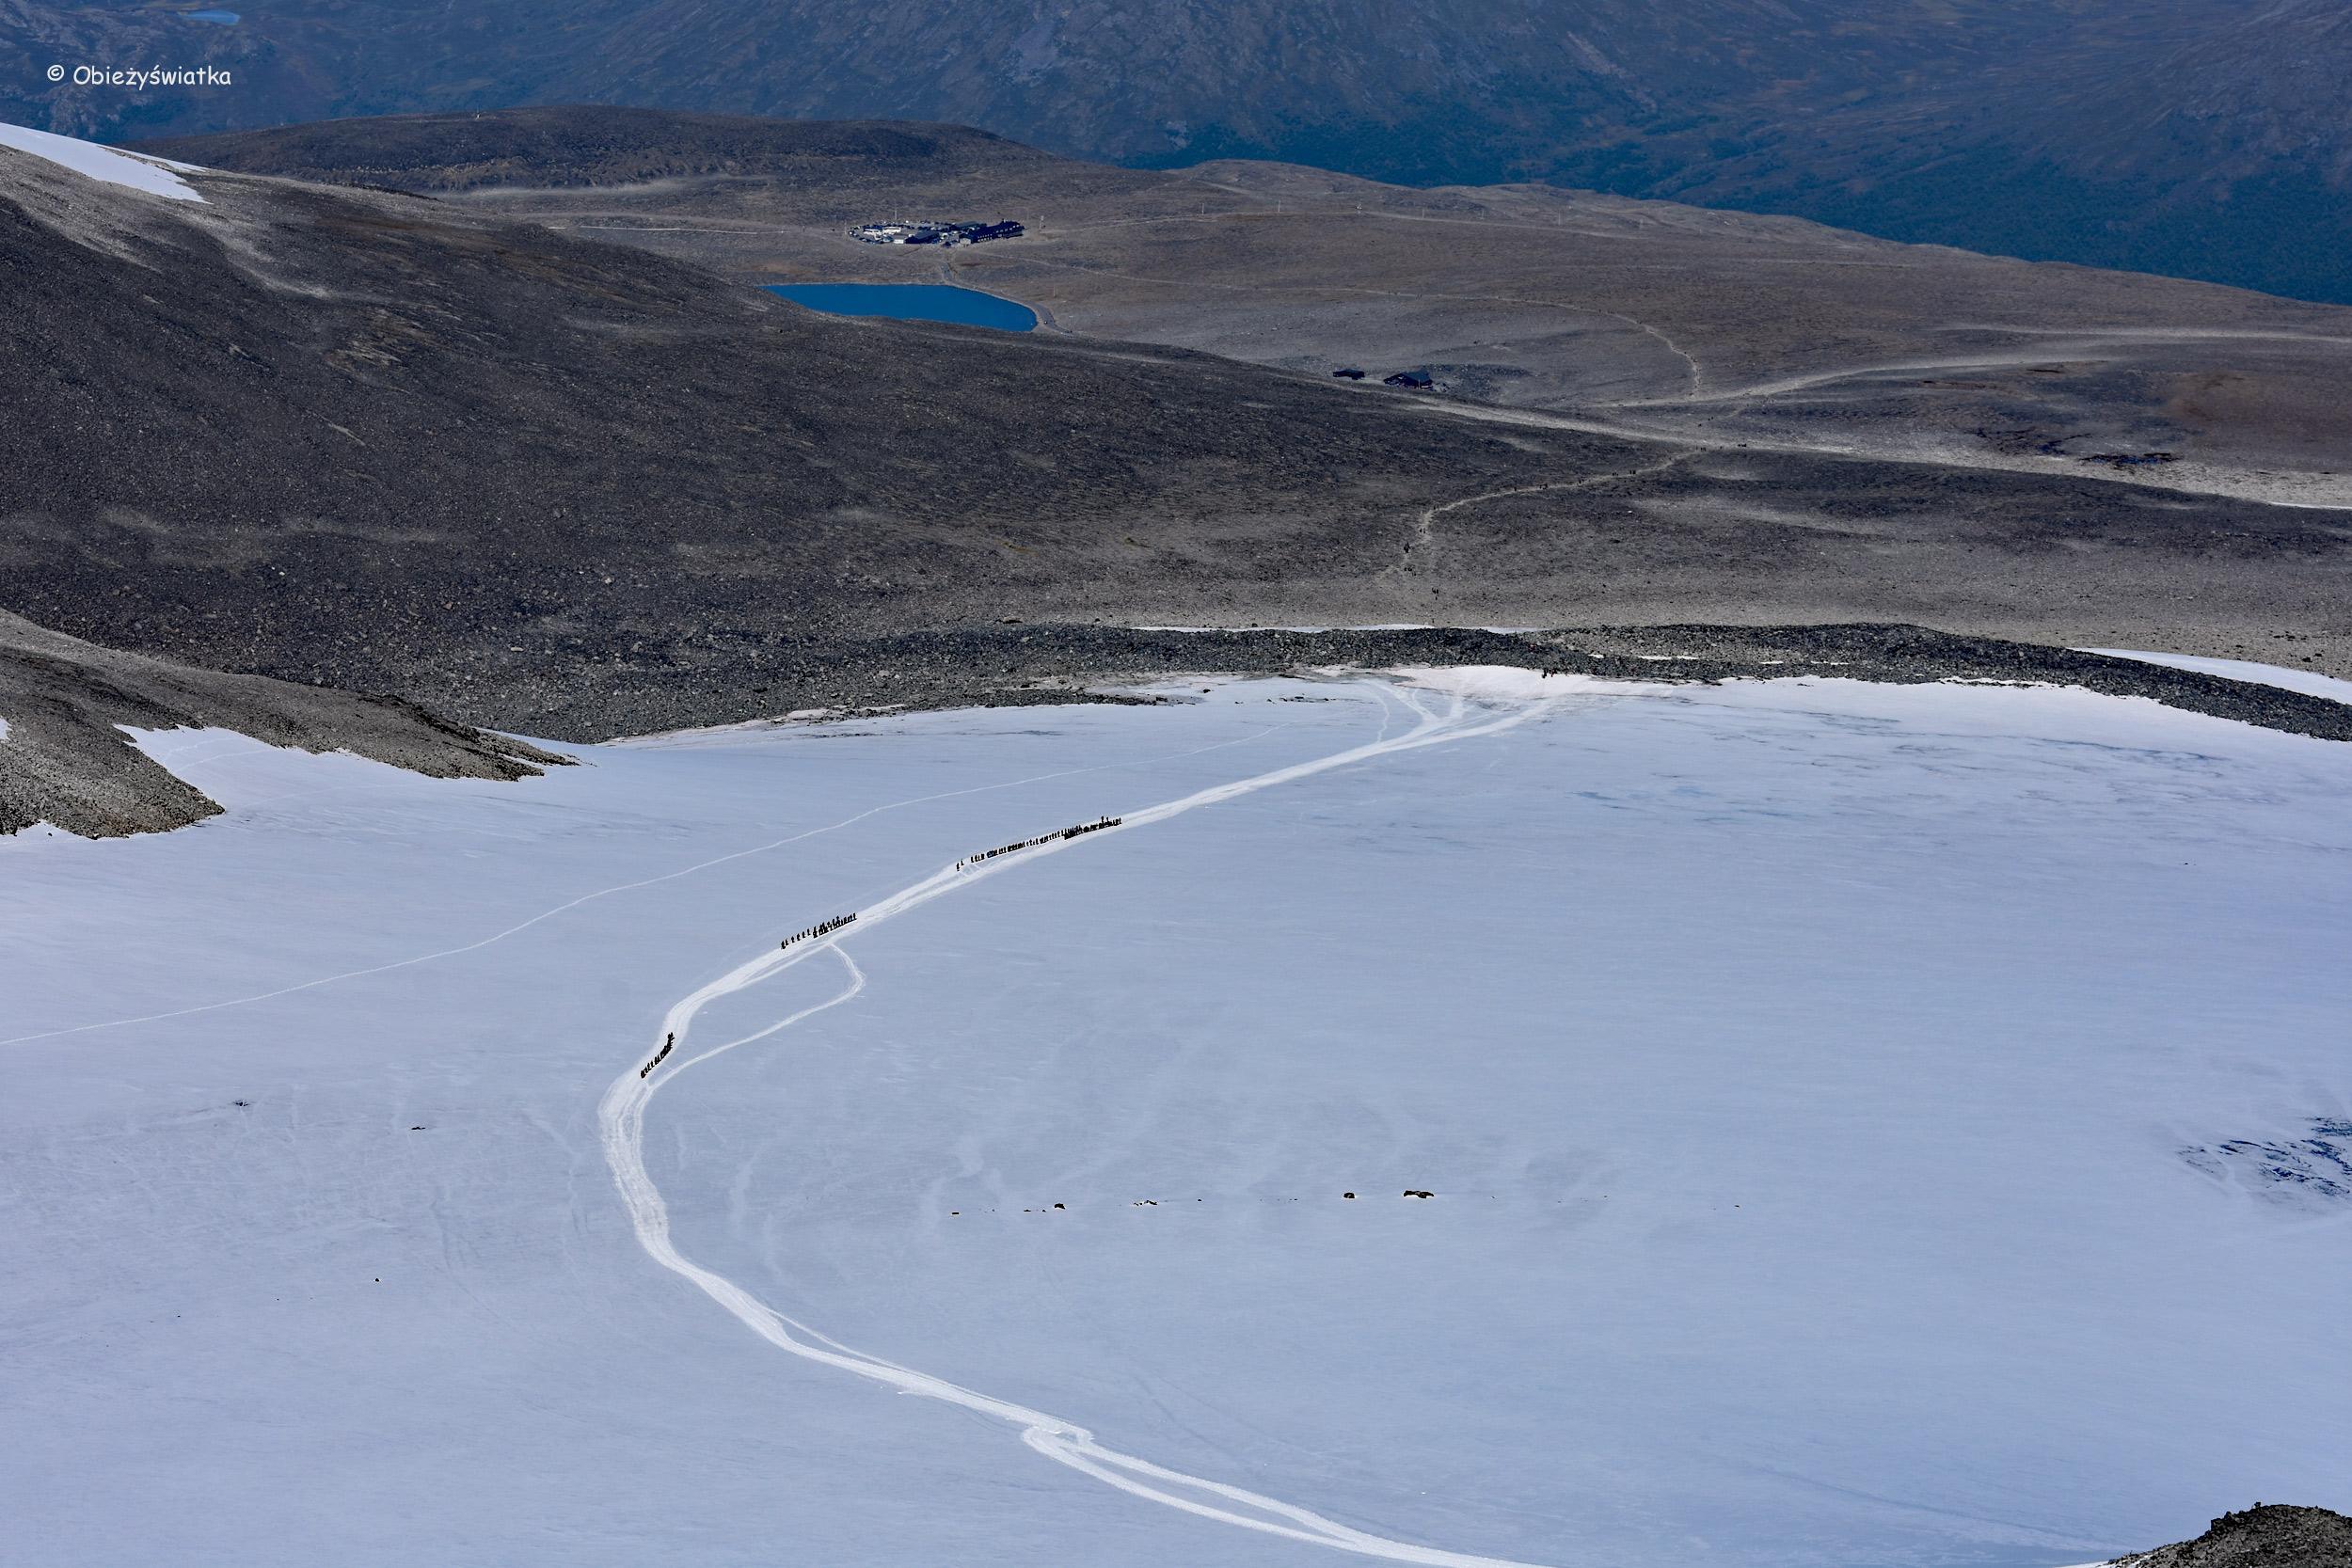 Szlak na Galdhopiggen po lodowcu